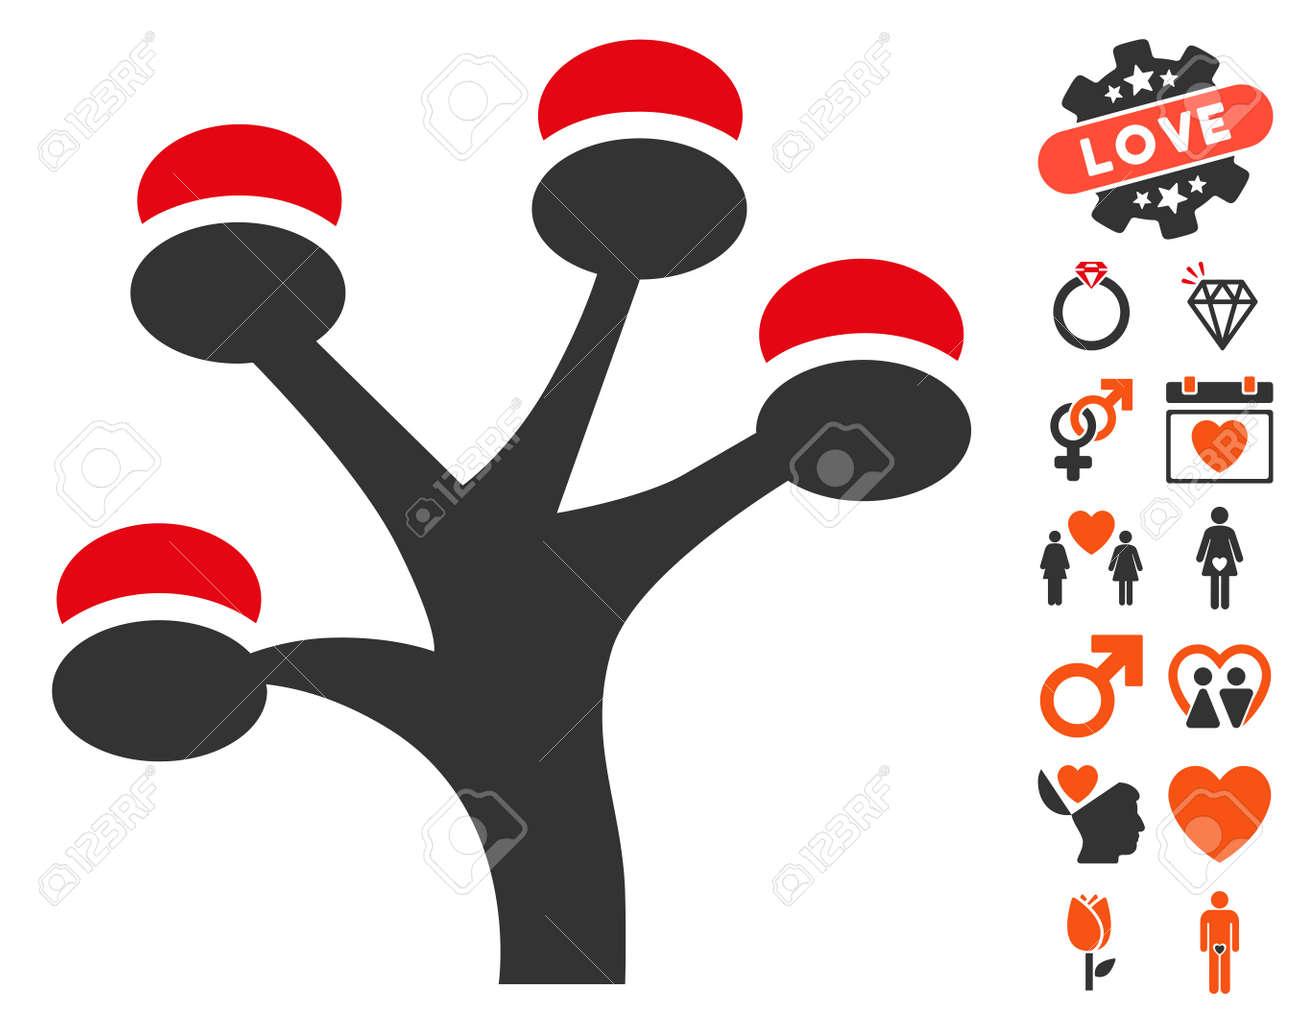 Money tree icon with bonus decorative clip art vector money tree icon with bonus decorative clip art vector illustration style is flat iconic symbols biocorpaavc Gallery